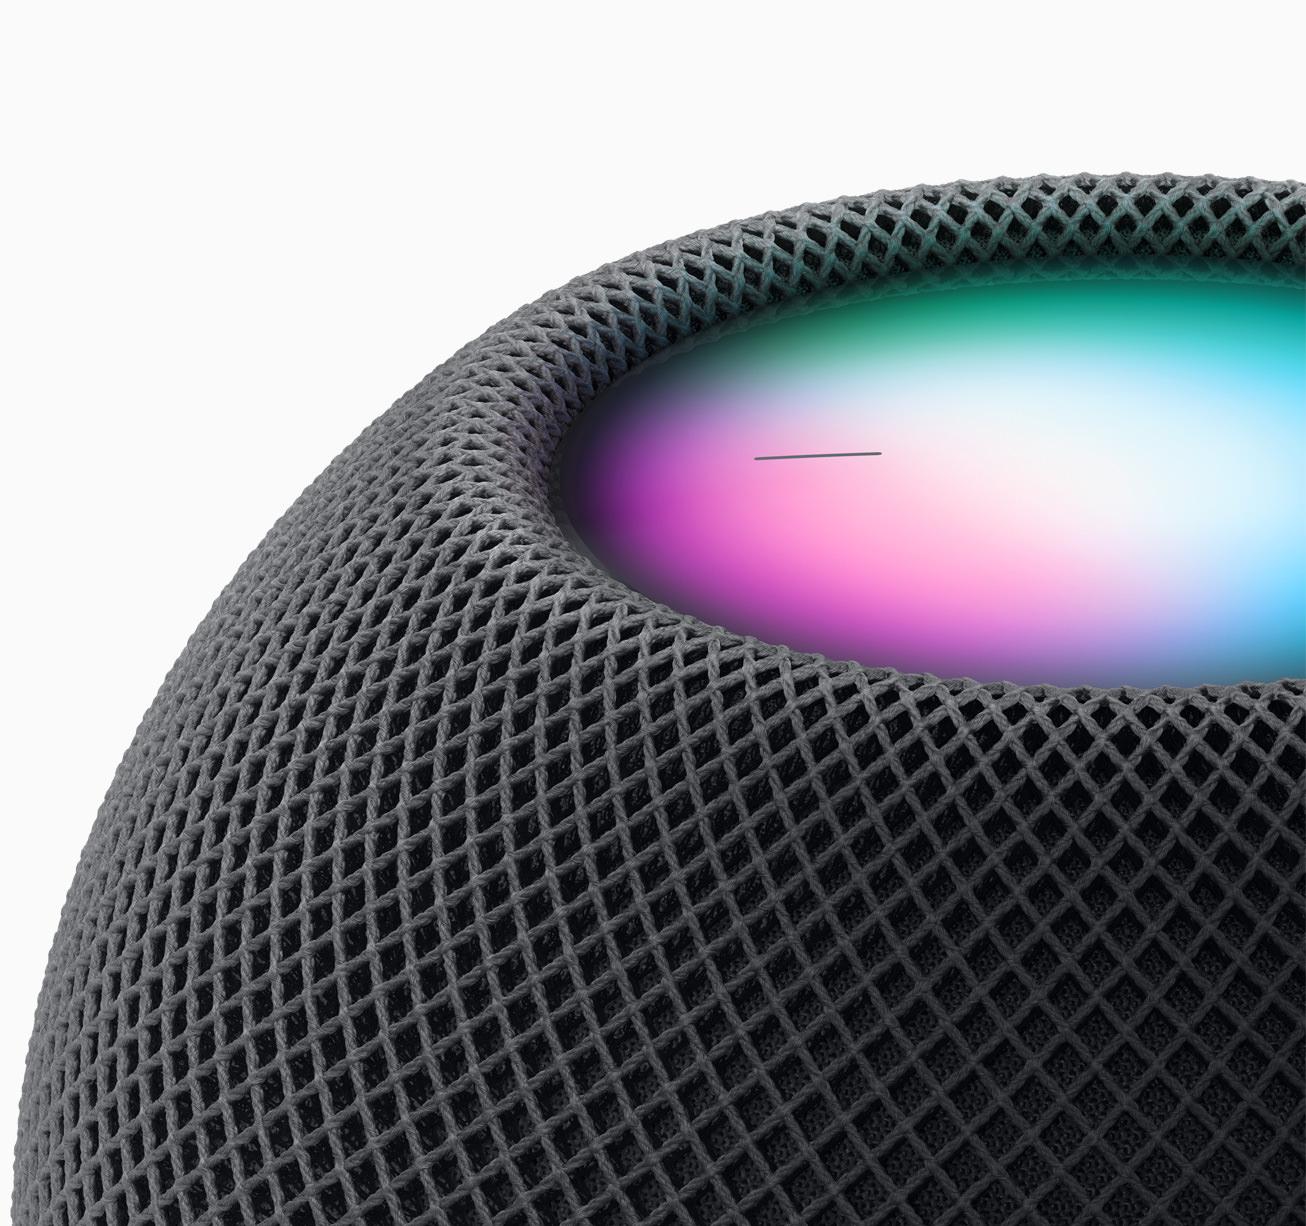 Apple_homepod-mini-space-gray-close-up_10132020